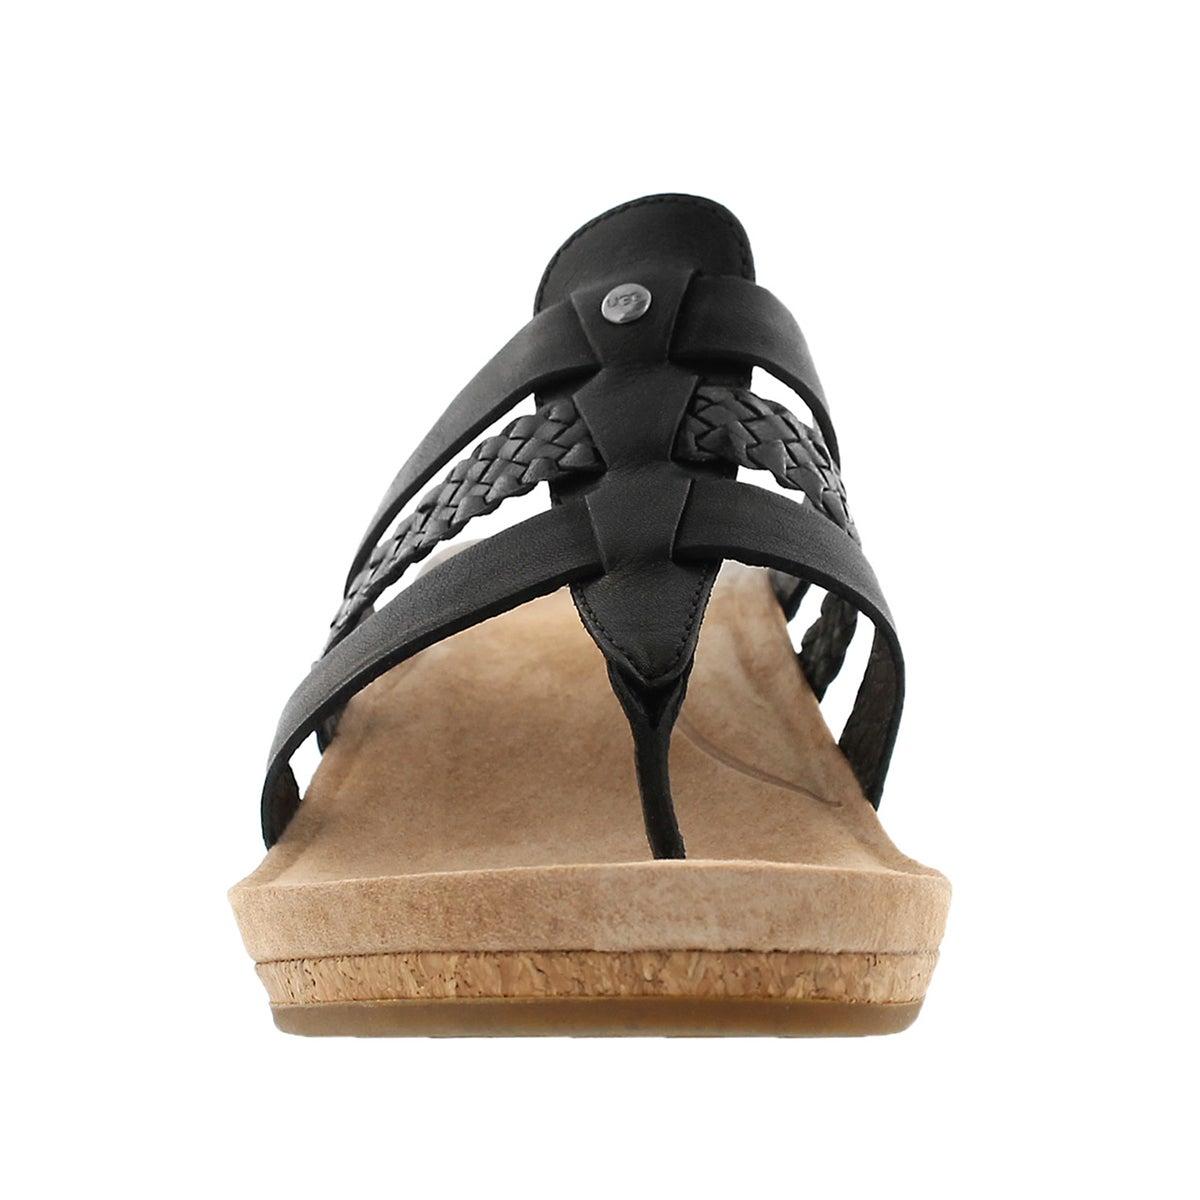 Lds Maddie blk wedge thong sandal